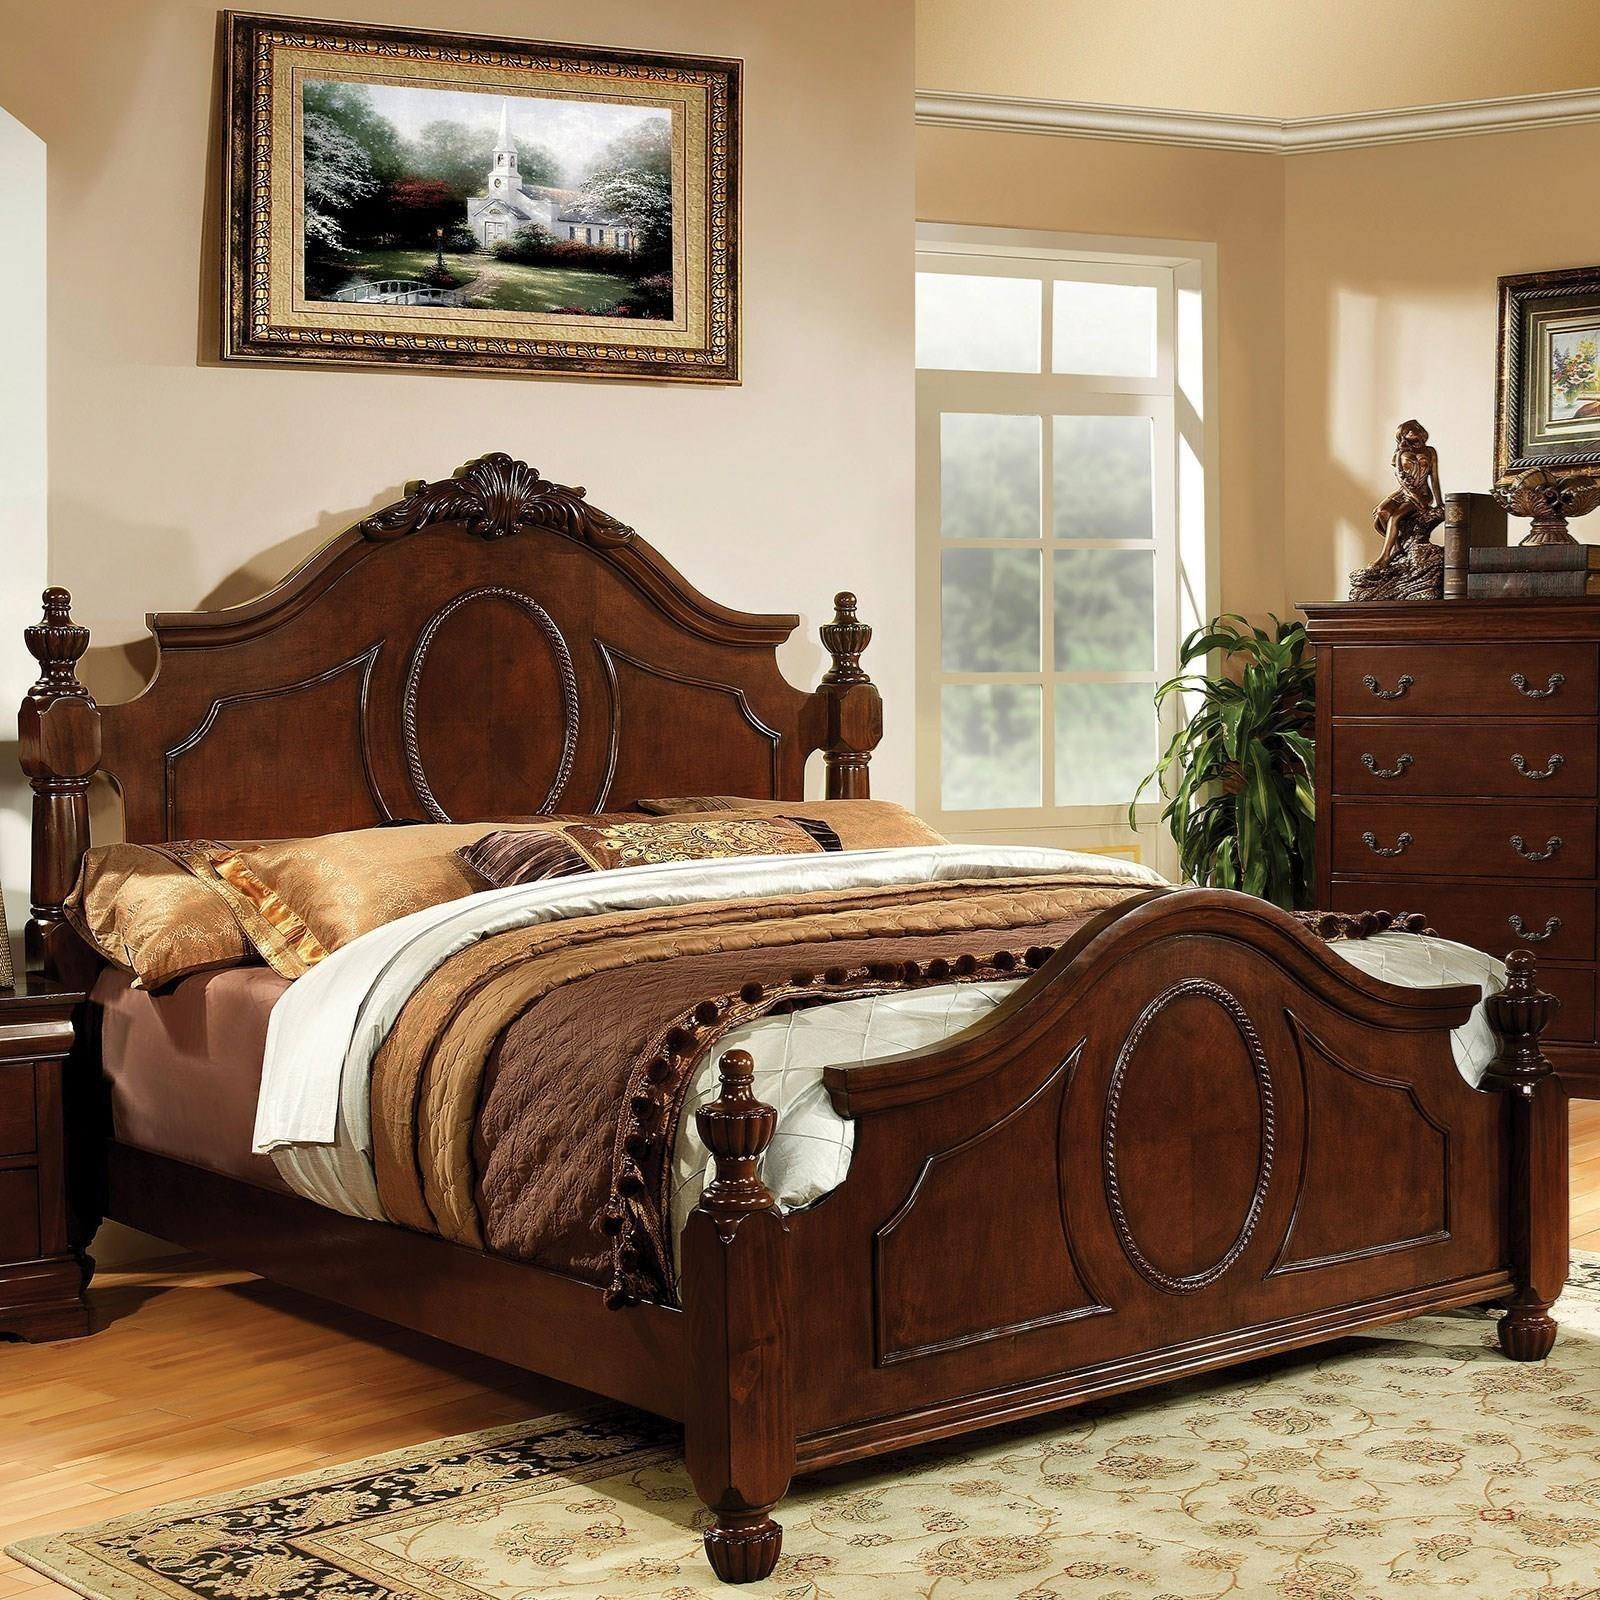 Velda II Queen Bed at Household Furniture